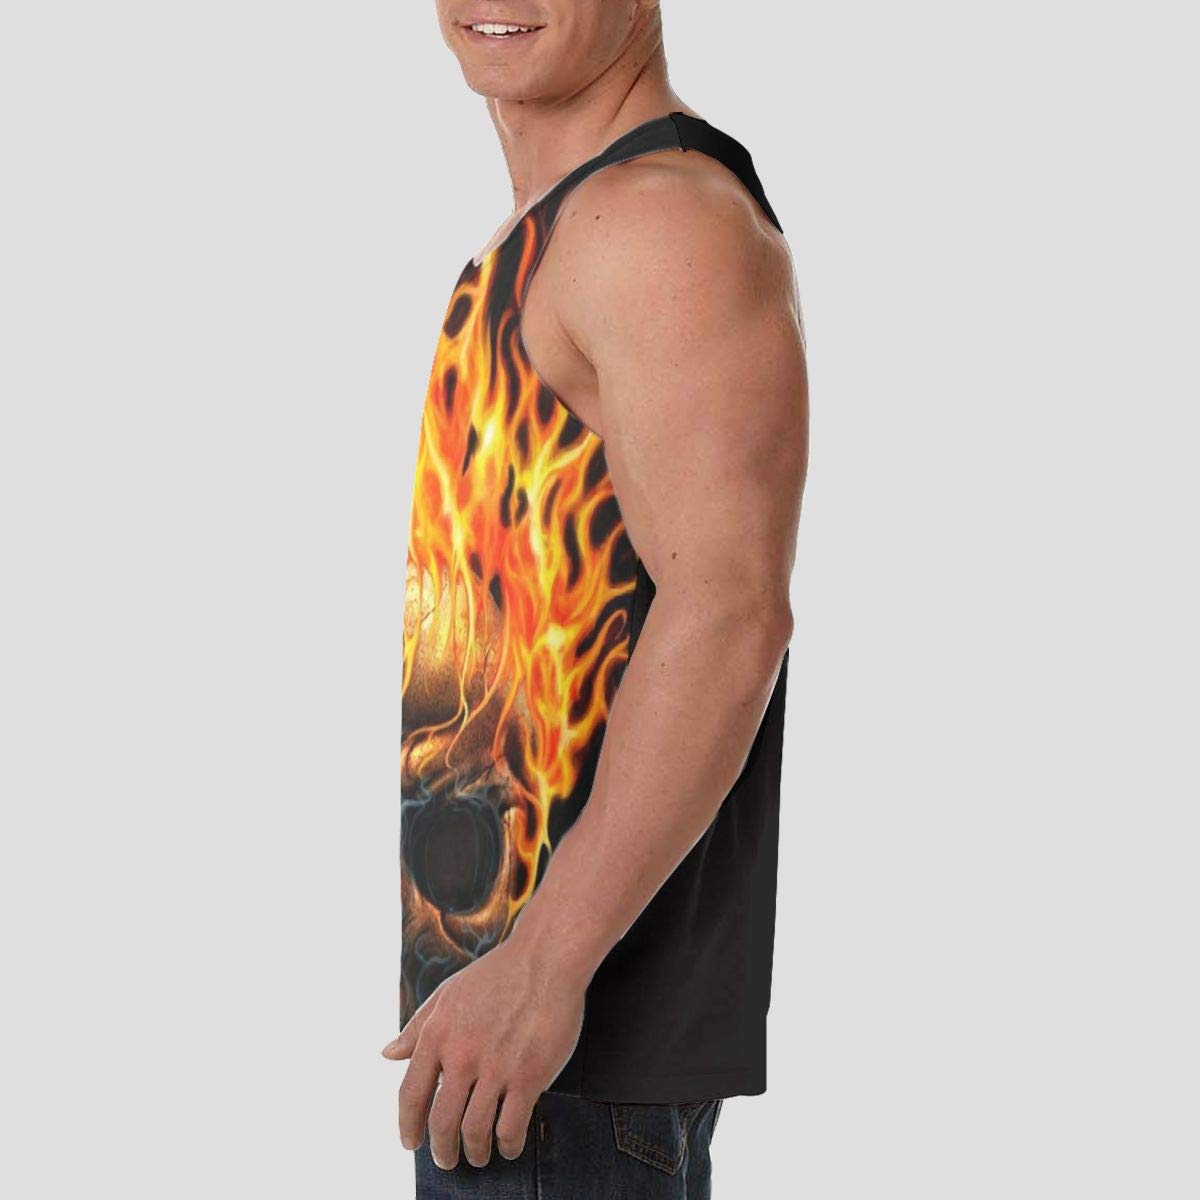 Men Boys Sleeveless Vest Shirts Summer Sweat Shirt Sportswear Sweatproof LIN